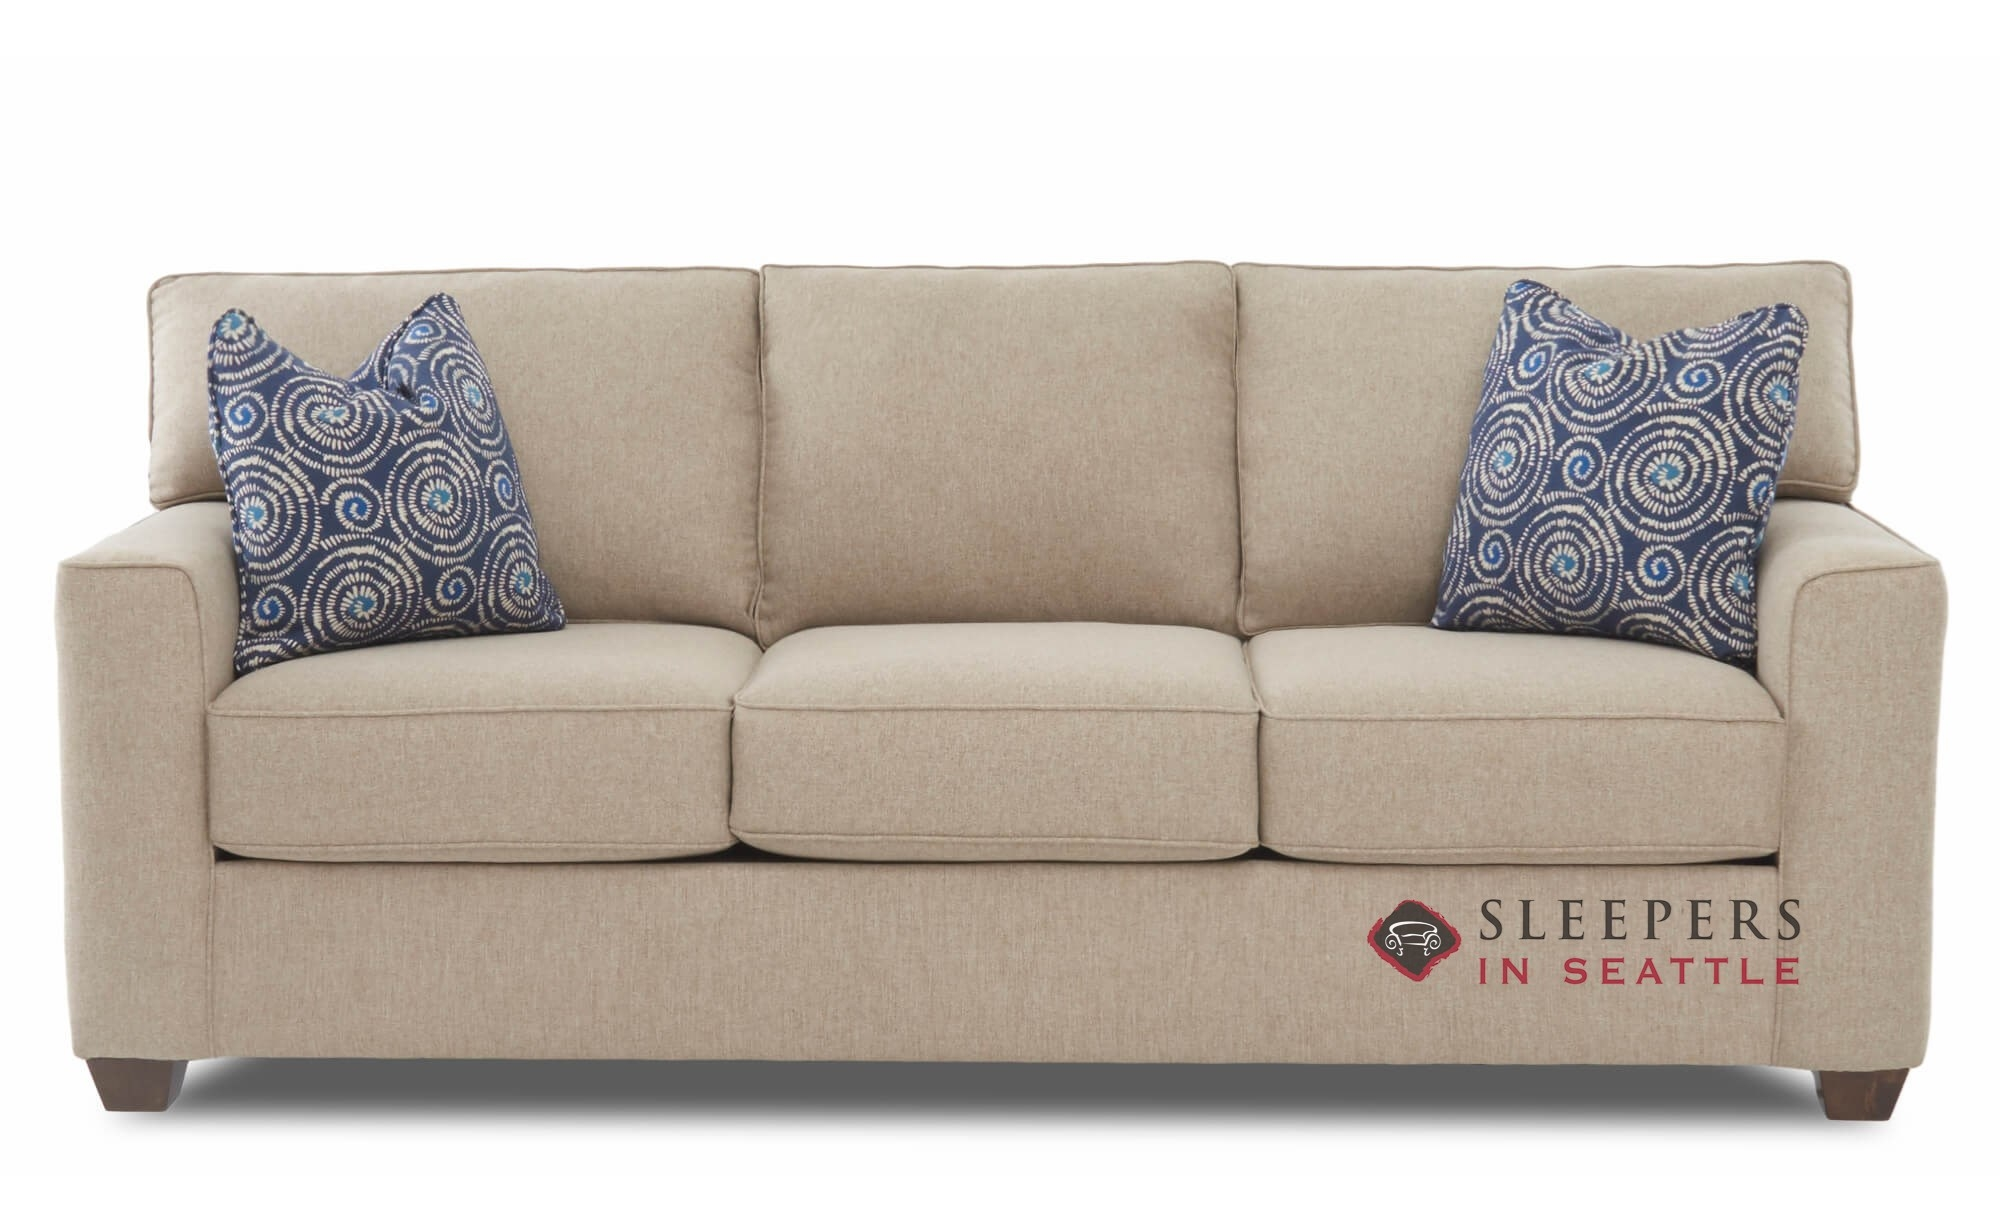 Newbury By Savvy Queen Fabric Sofa